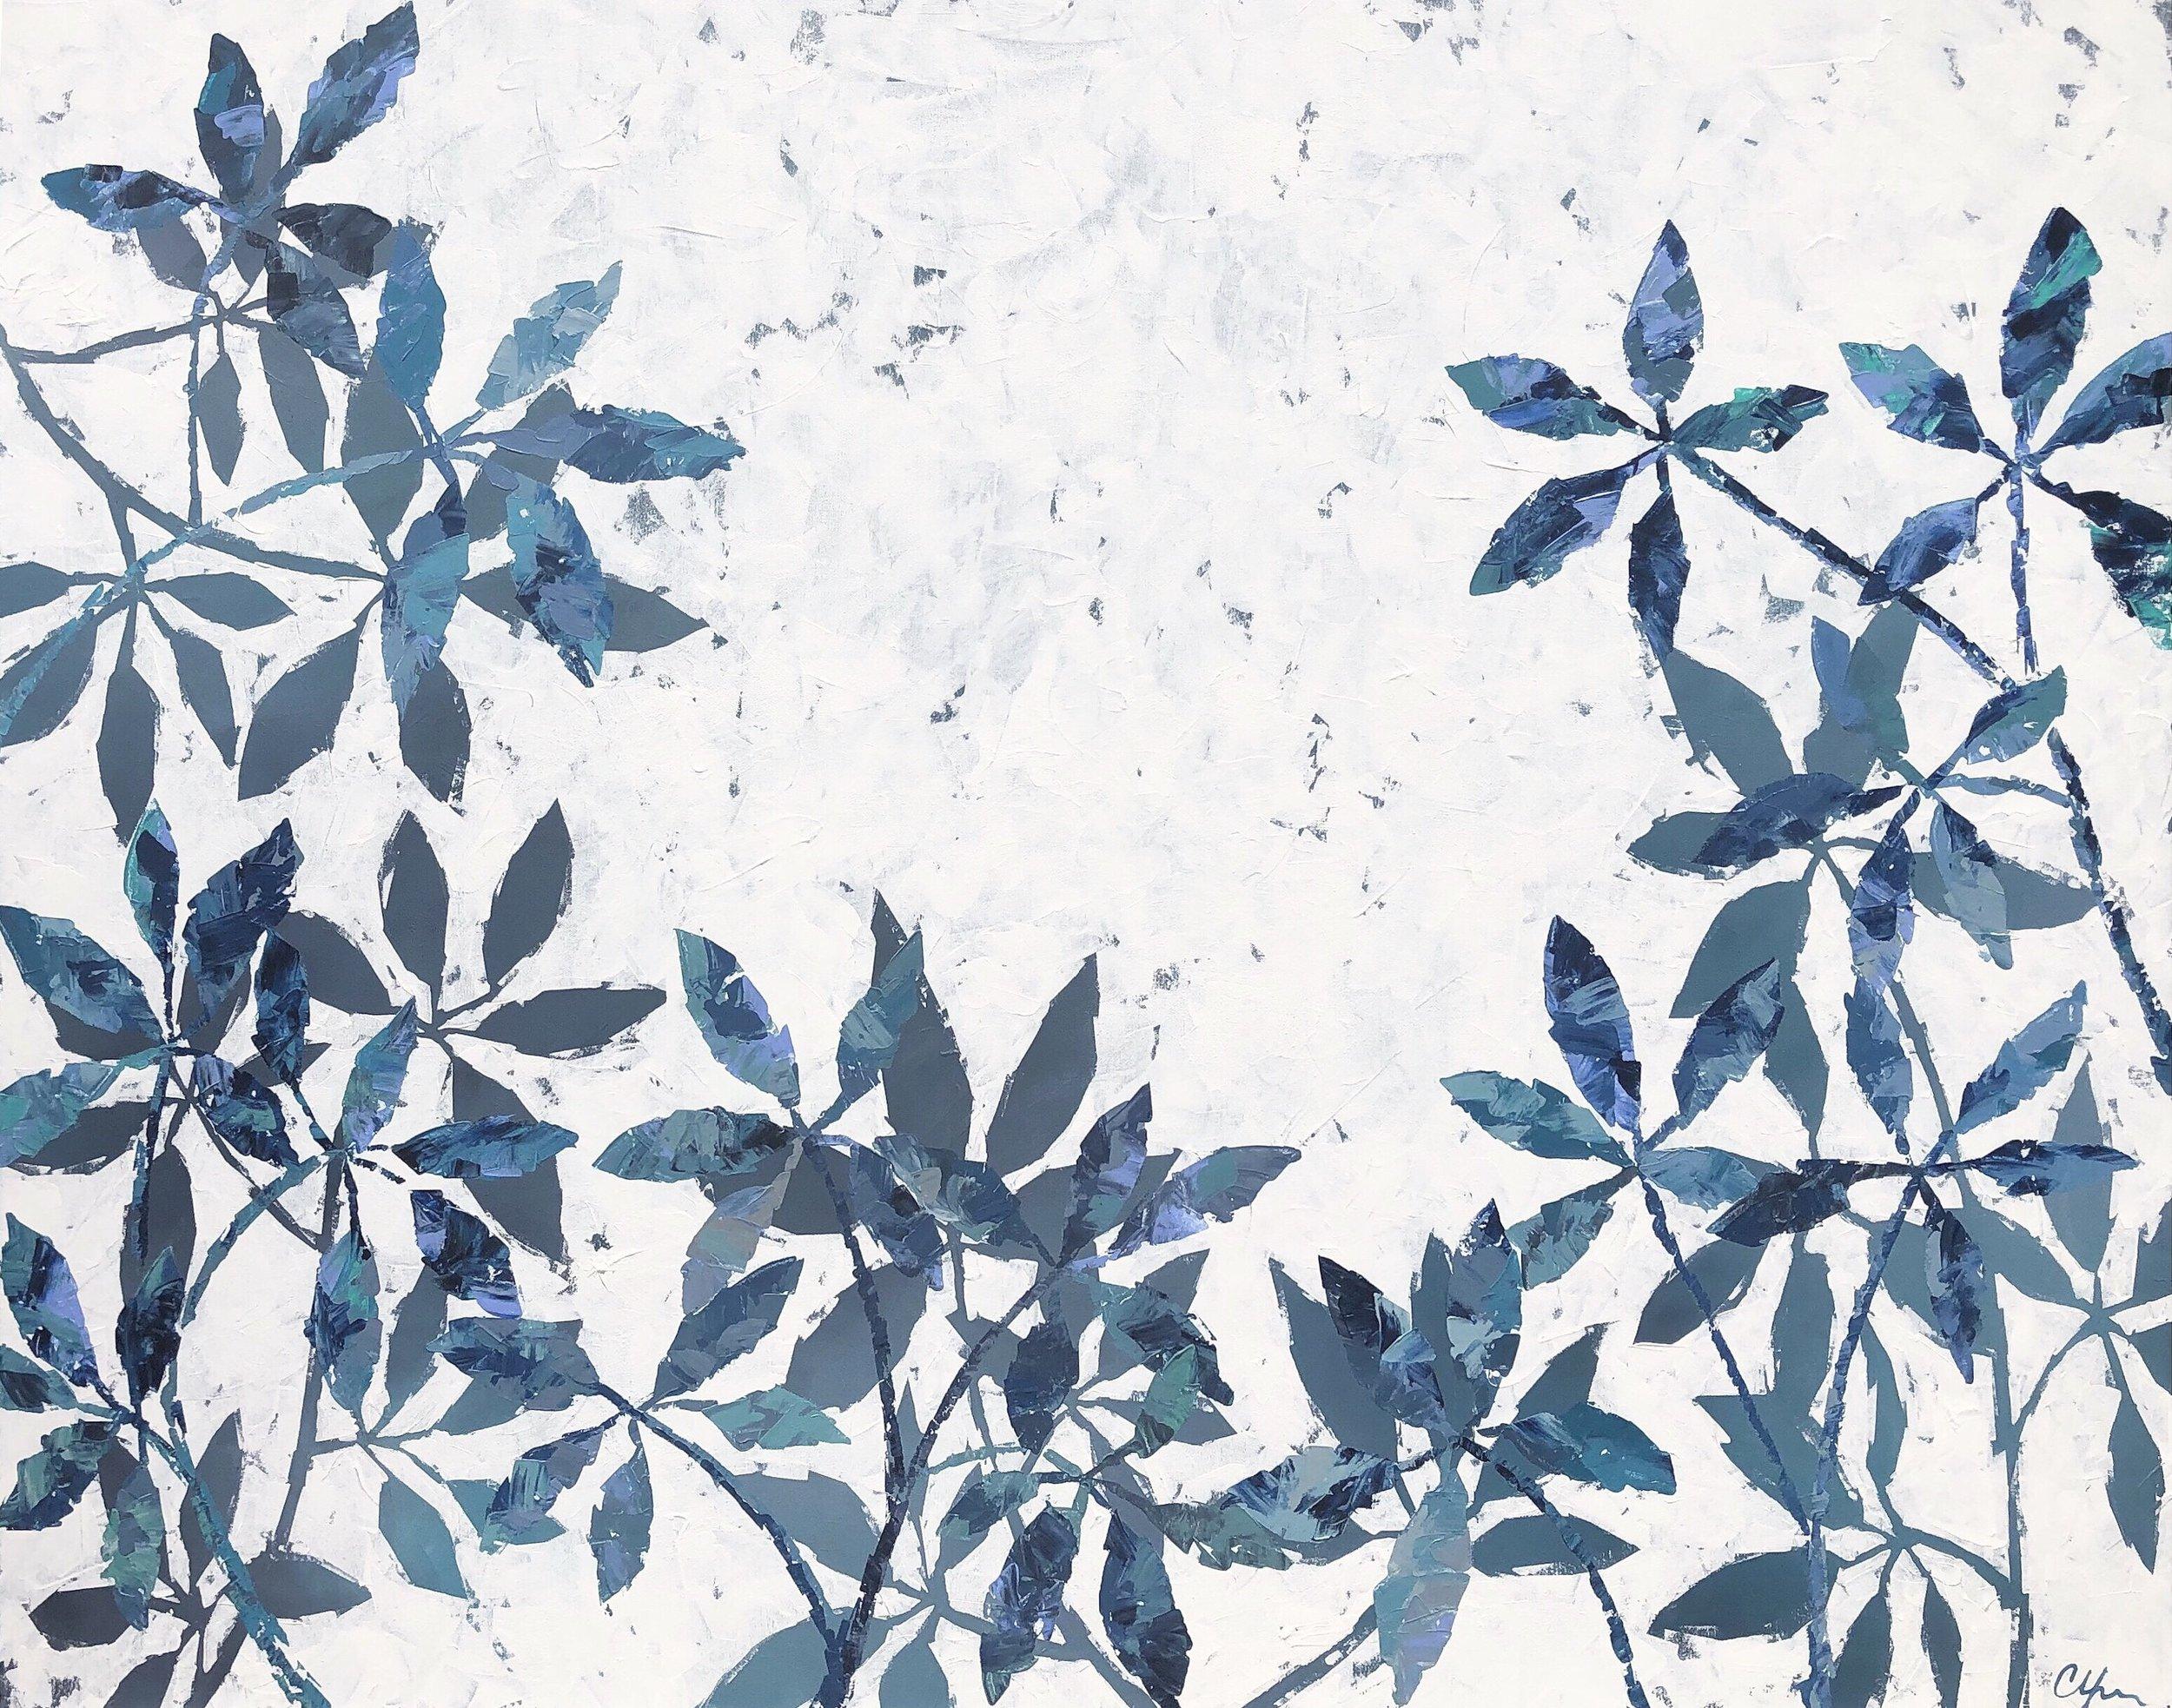 Shades of Blue II 48x60